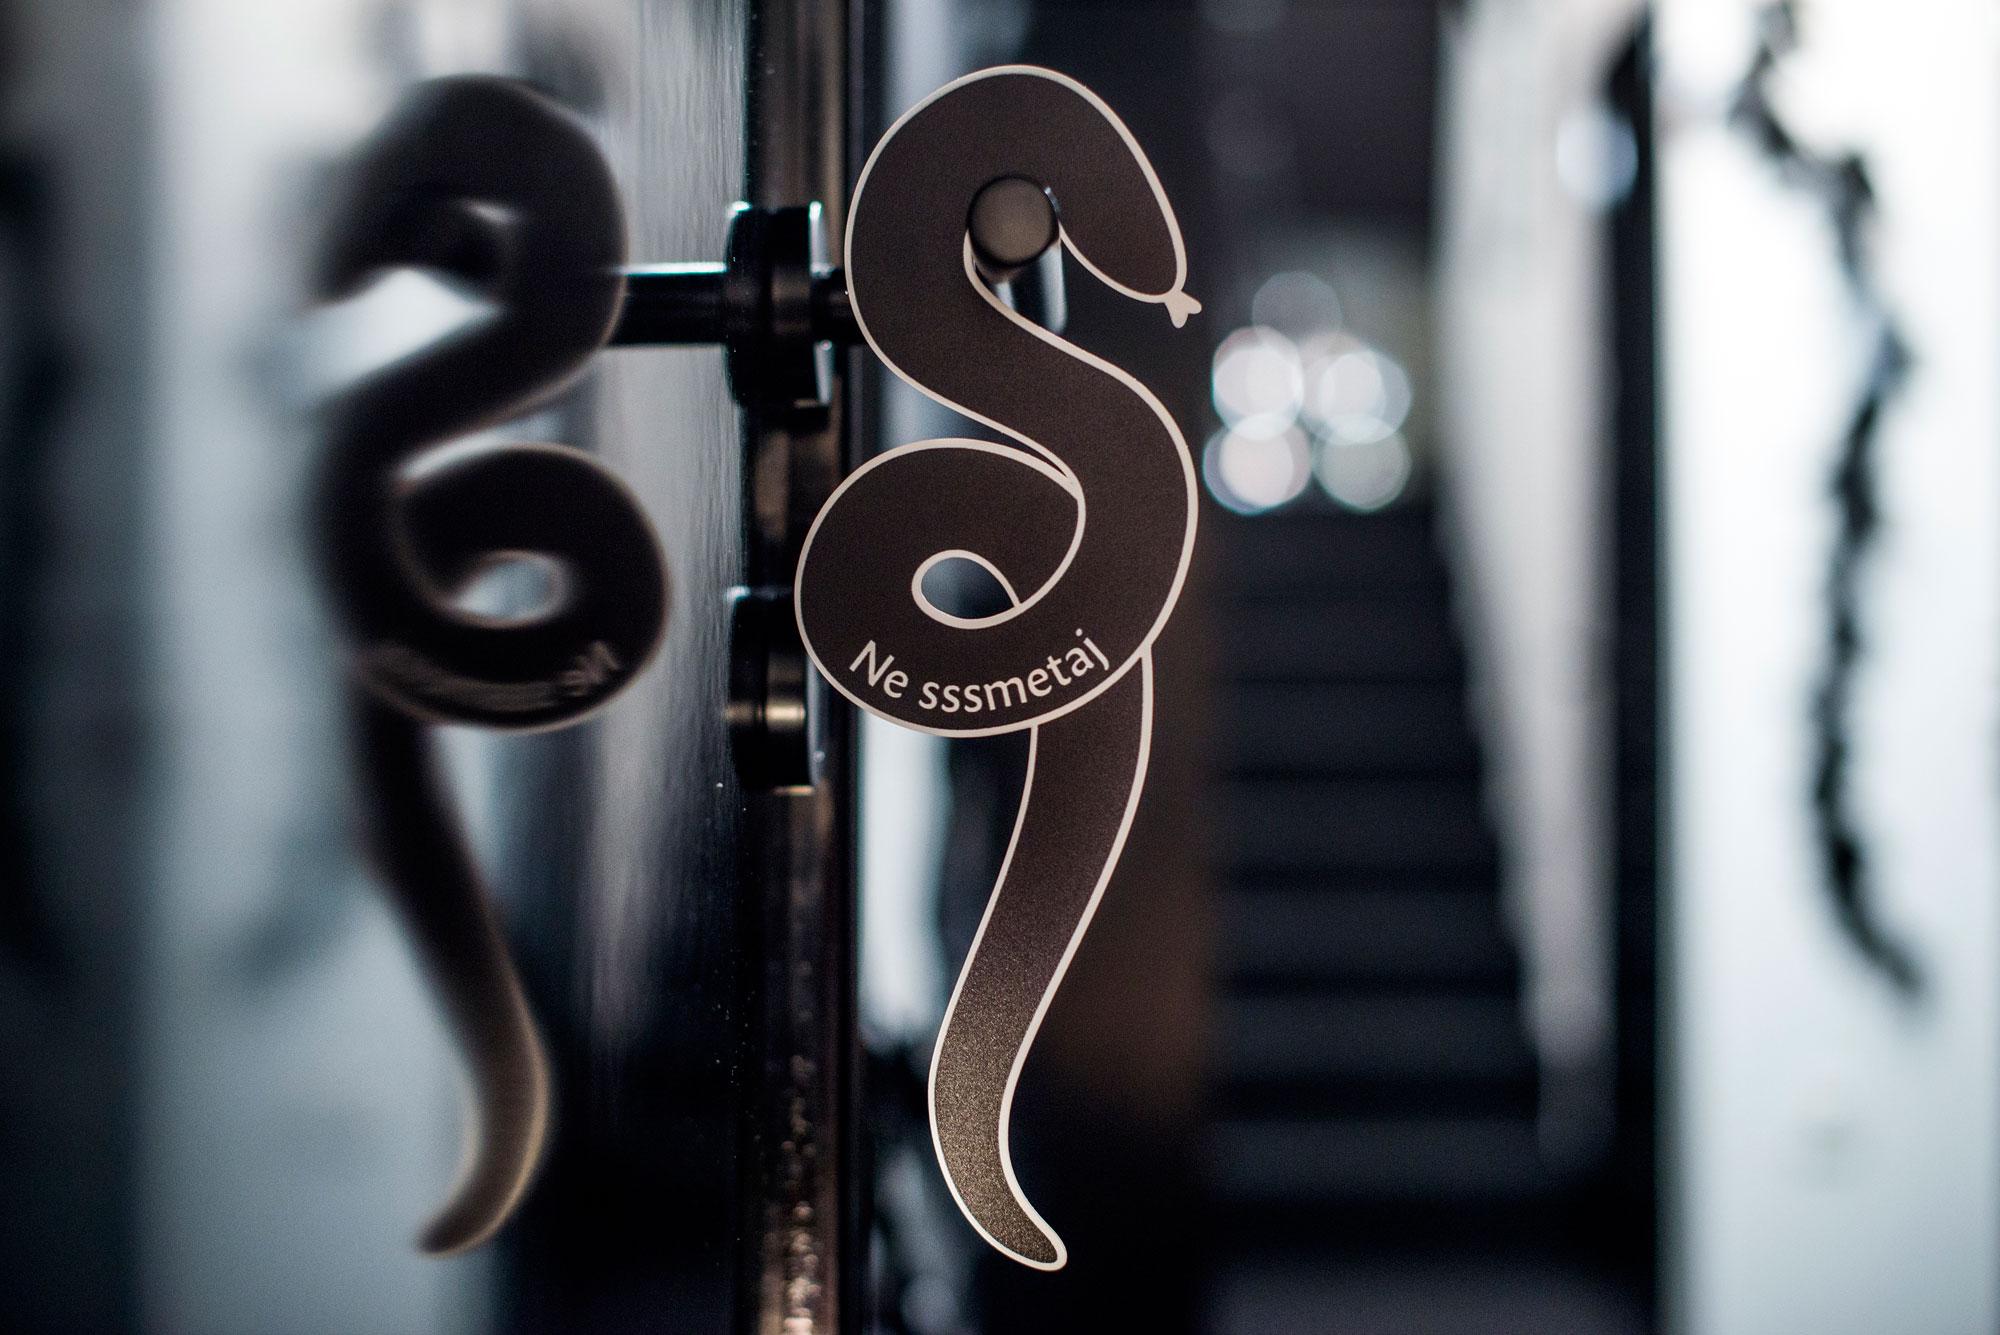 masavukmanovic.com - hotel prica - way-finding 10